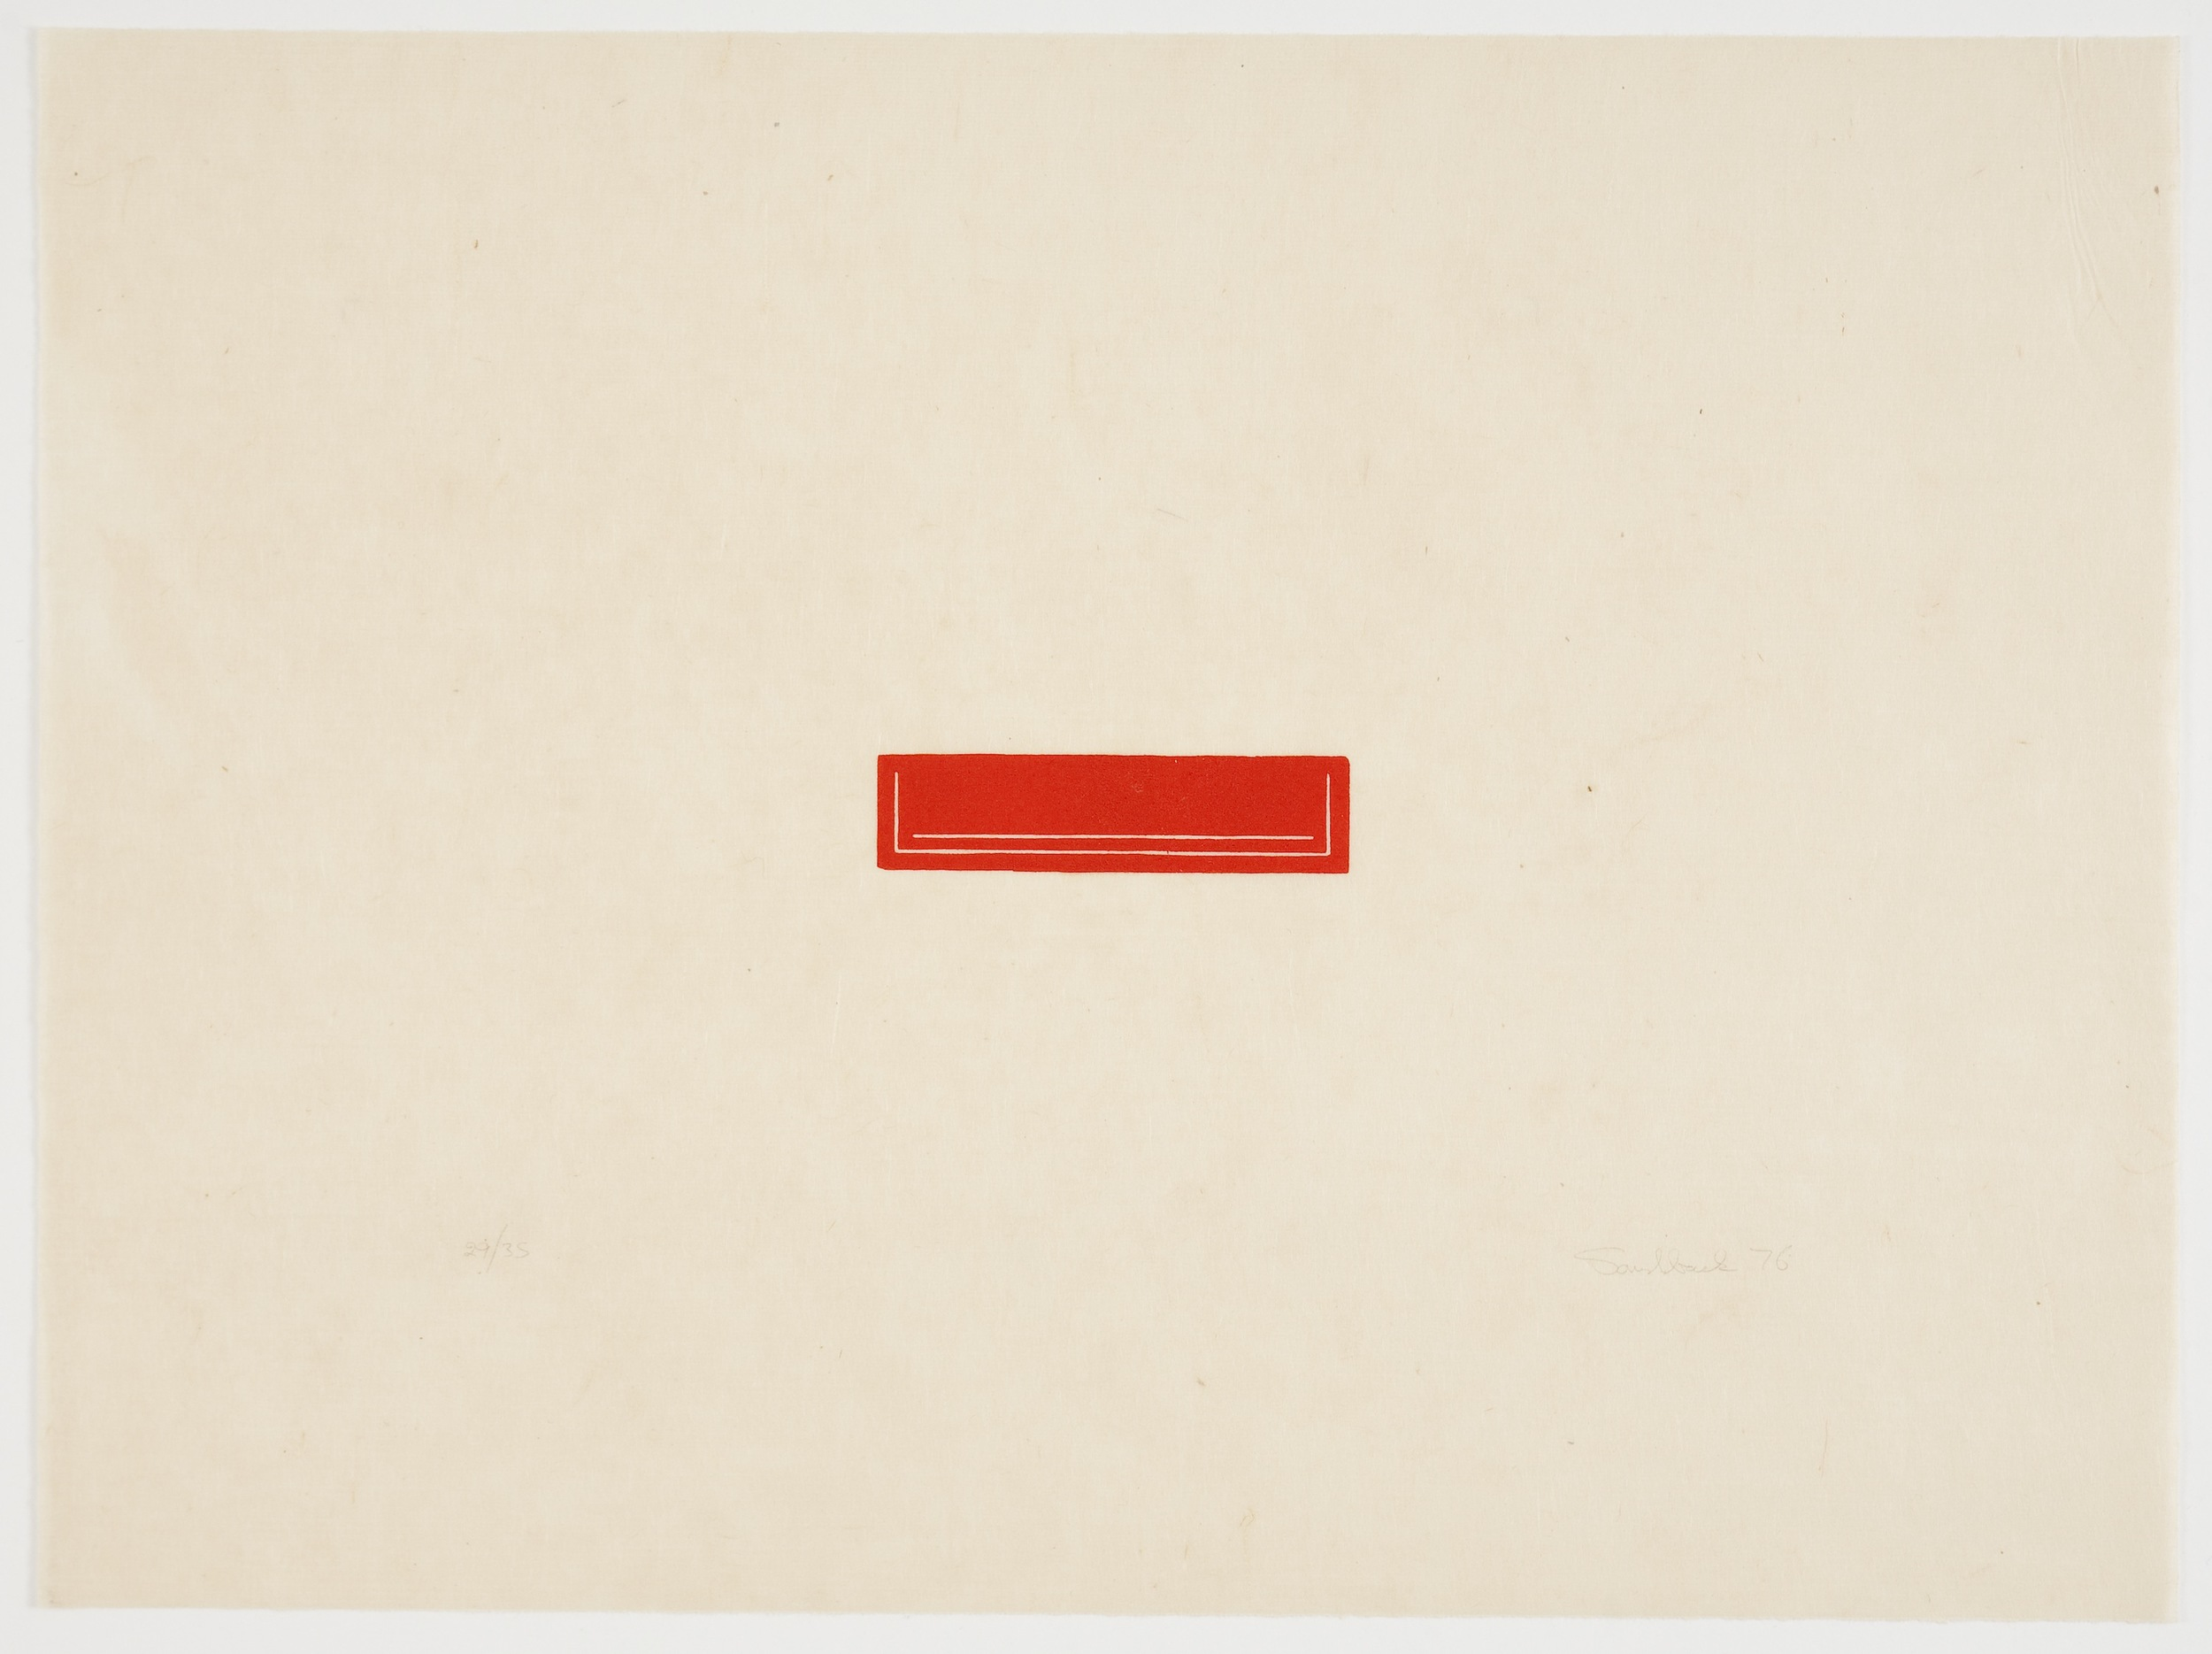 Fred Sandback, Untitled, 1976, Woodcut on Japanese paper